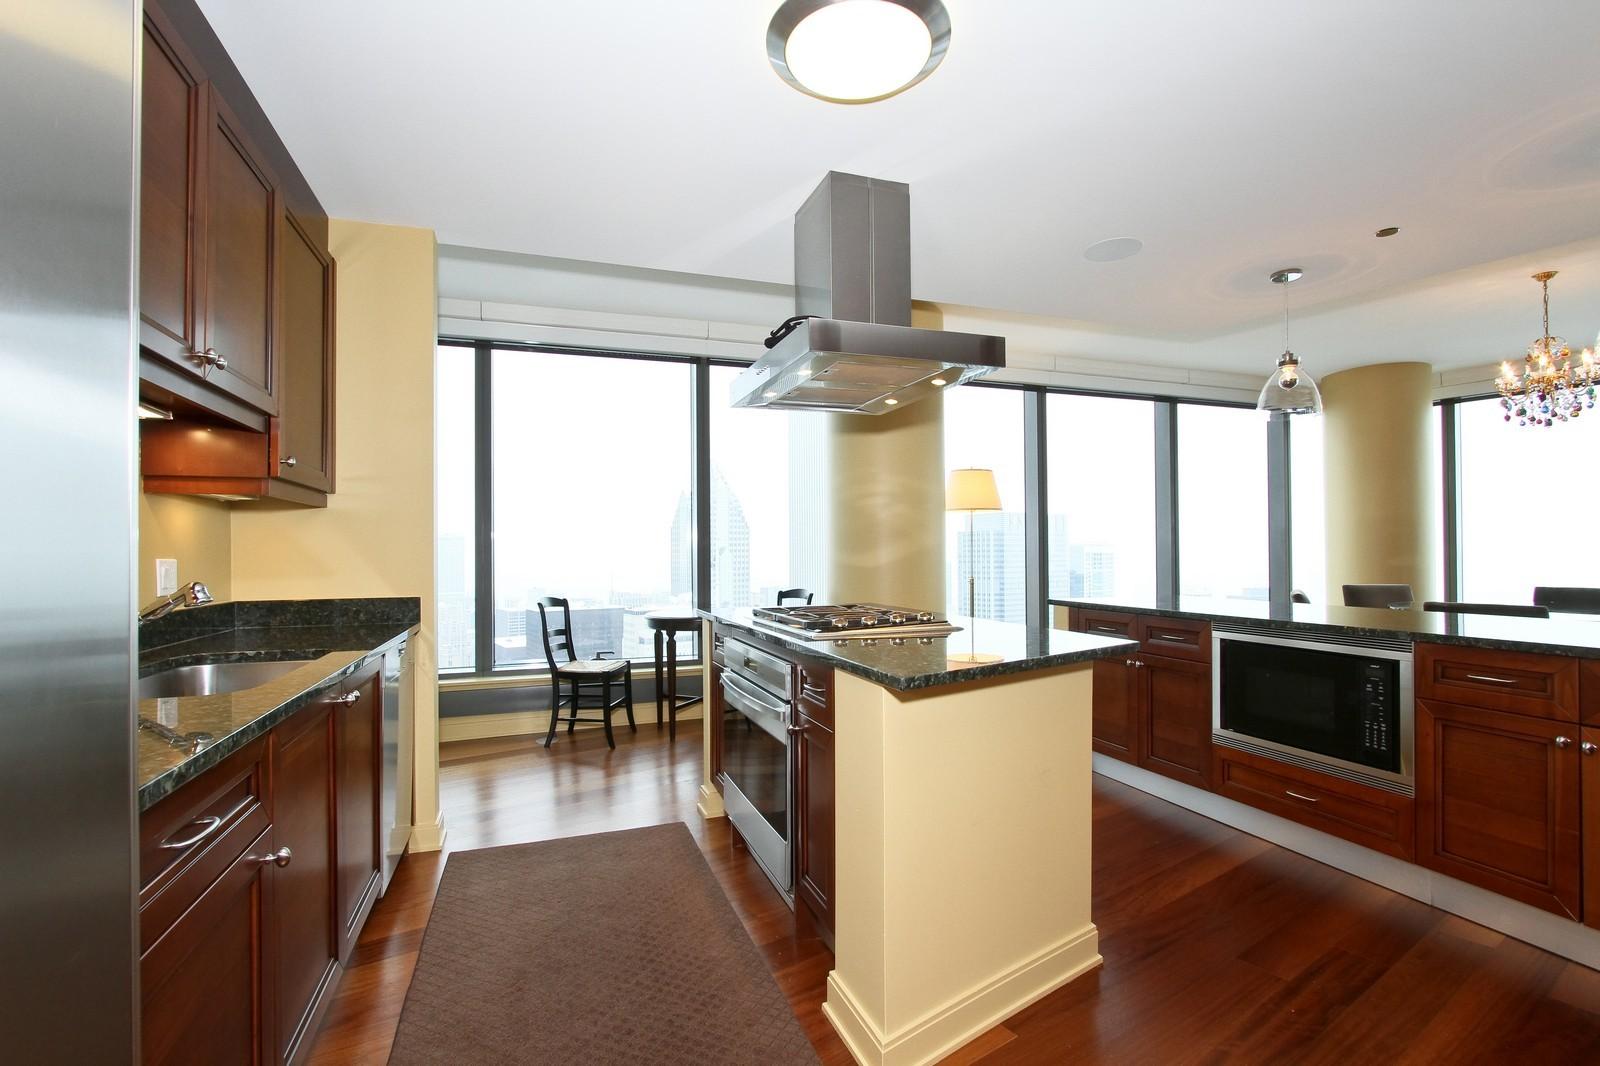 Real Estate Photography - 60 E Monroe, 6501, Chicago, IL, 60603 - Kitchen